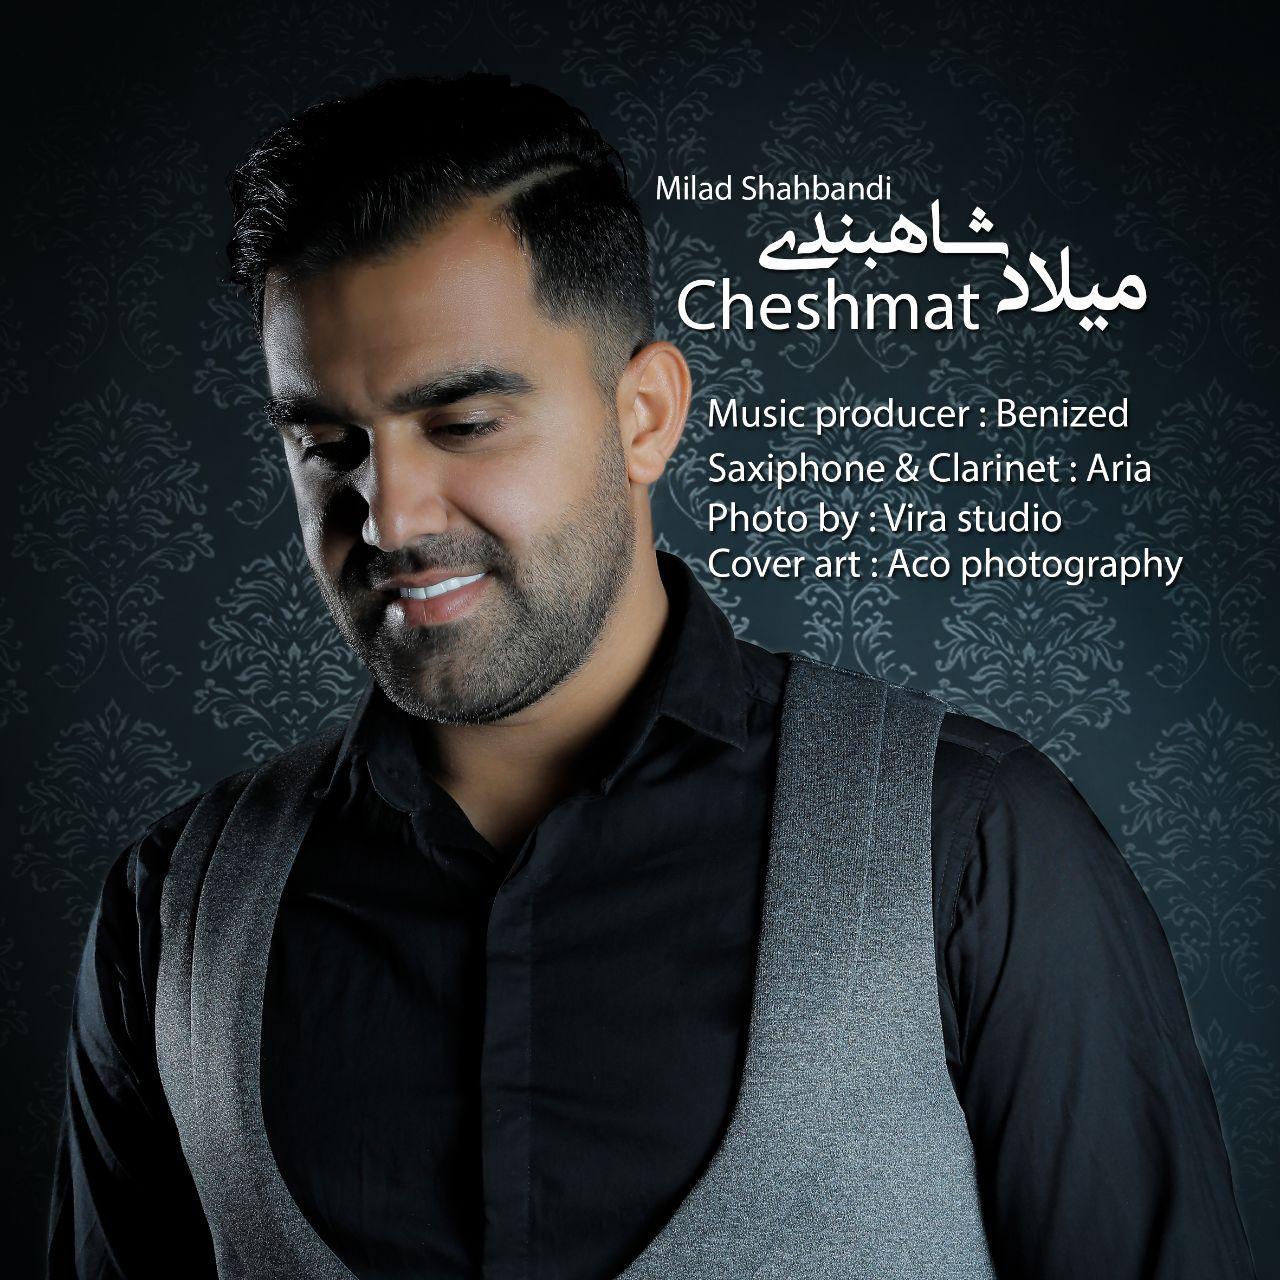 Milad Shahbandi – Cheshmat